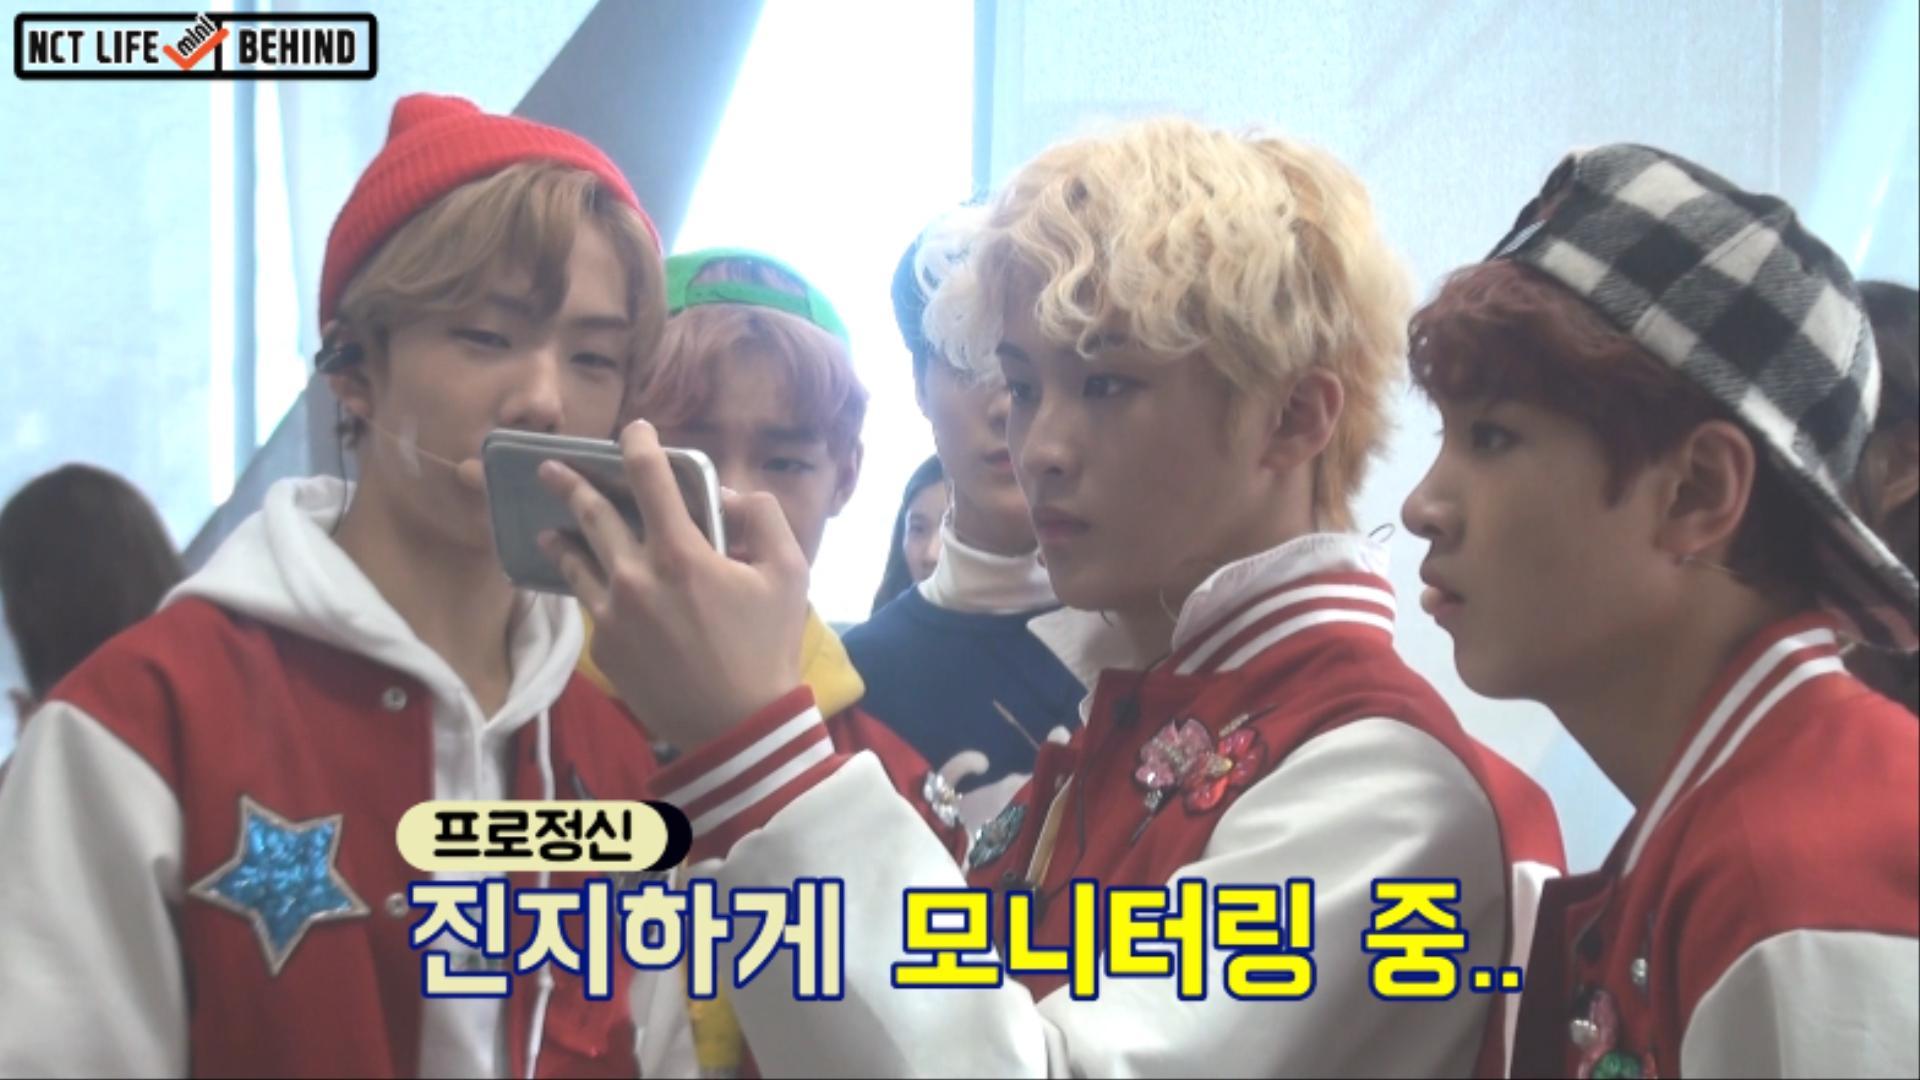 [NCT LIFE MINI] BEHIND_음악중심 대기실